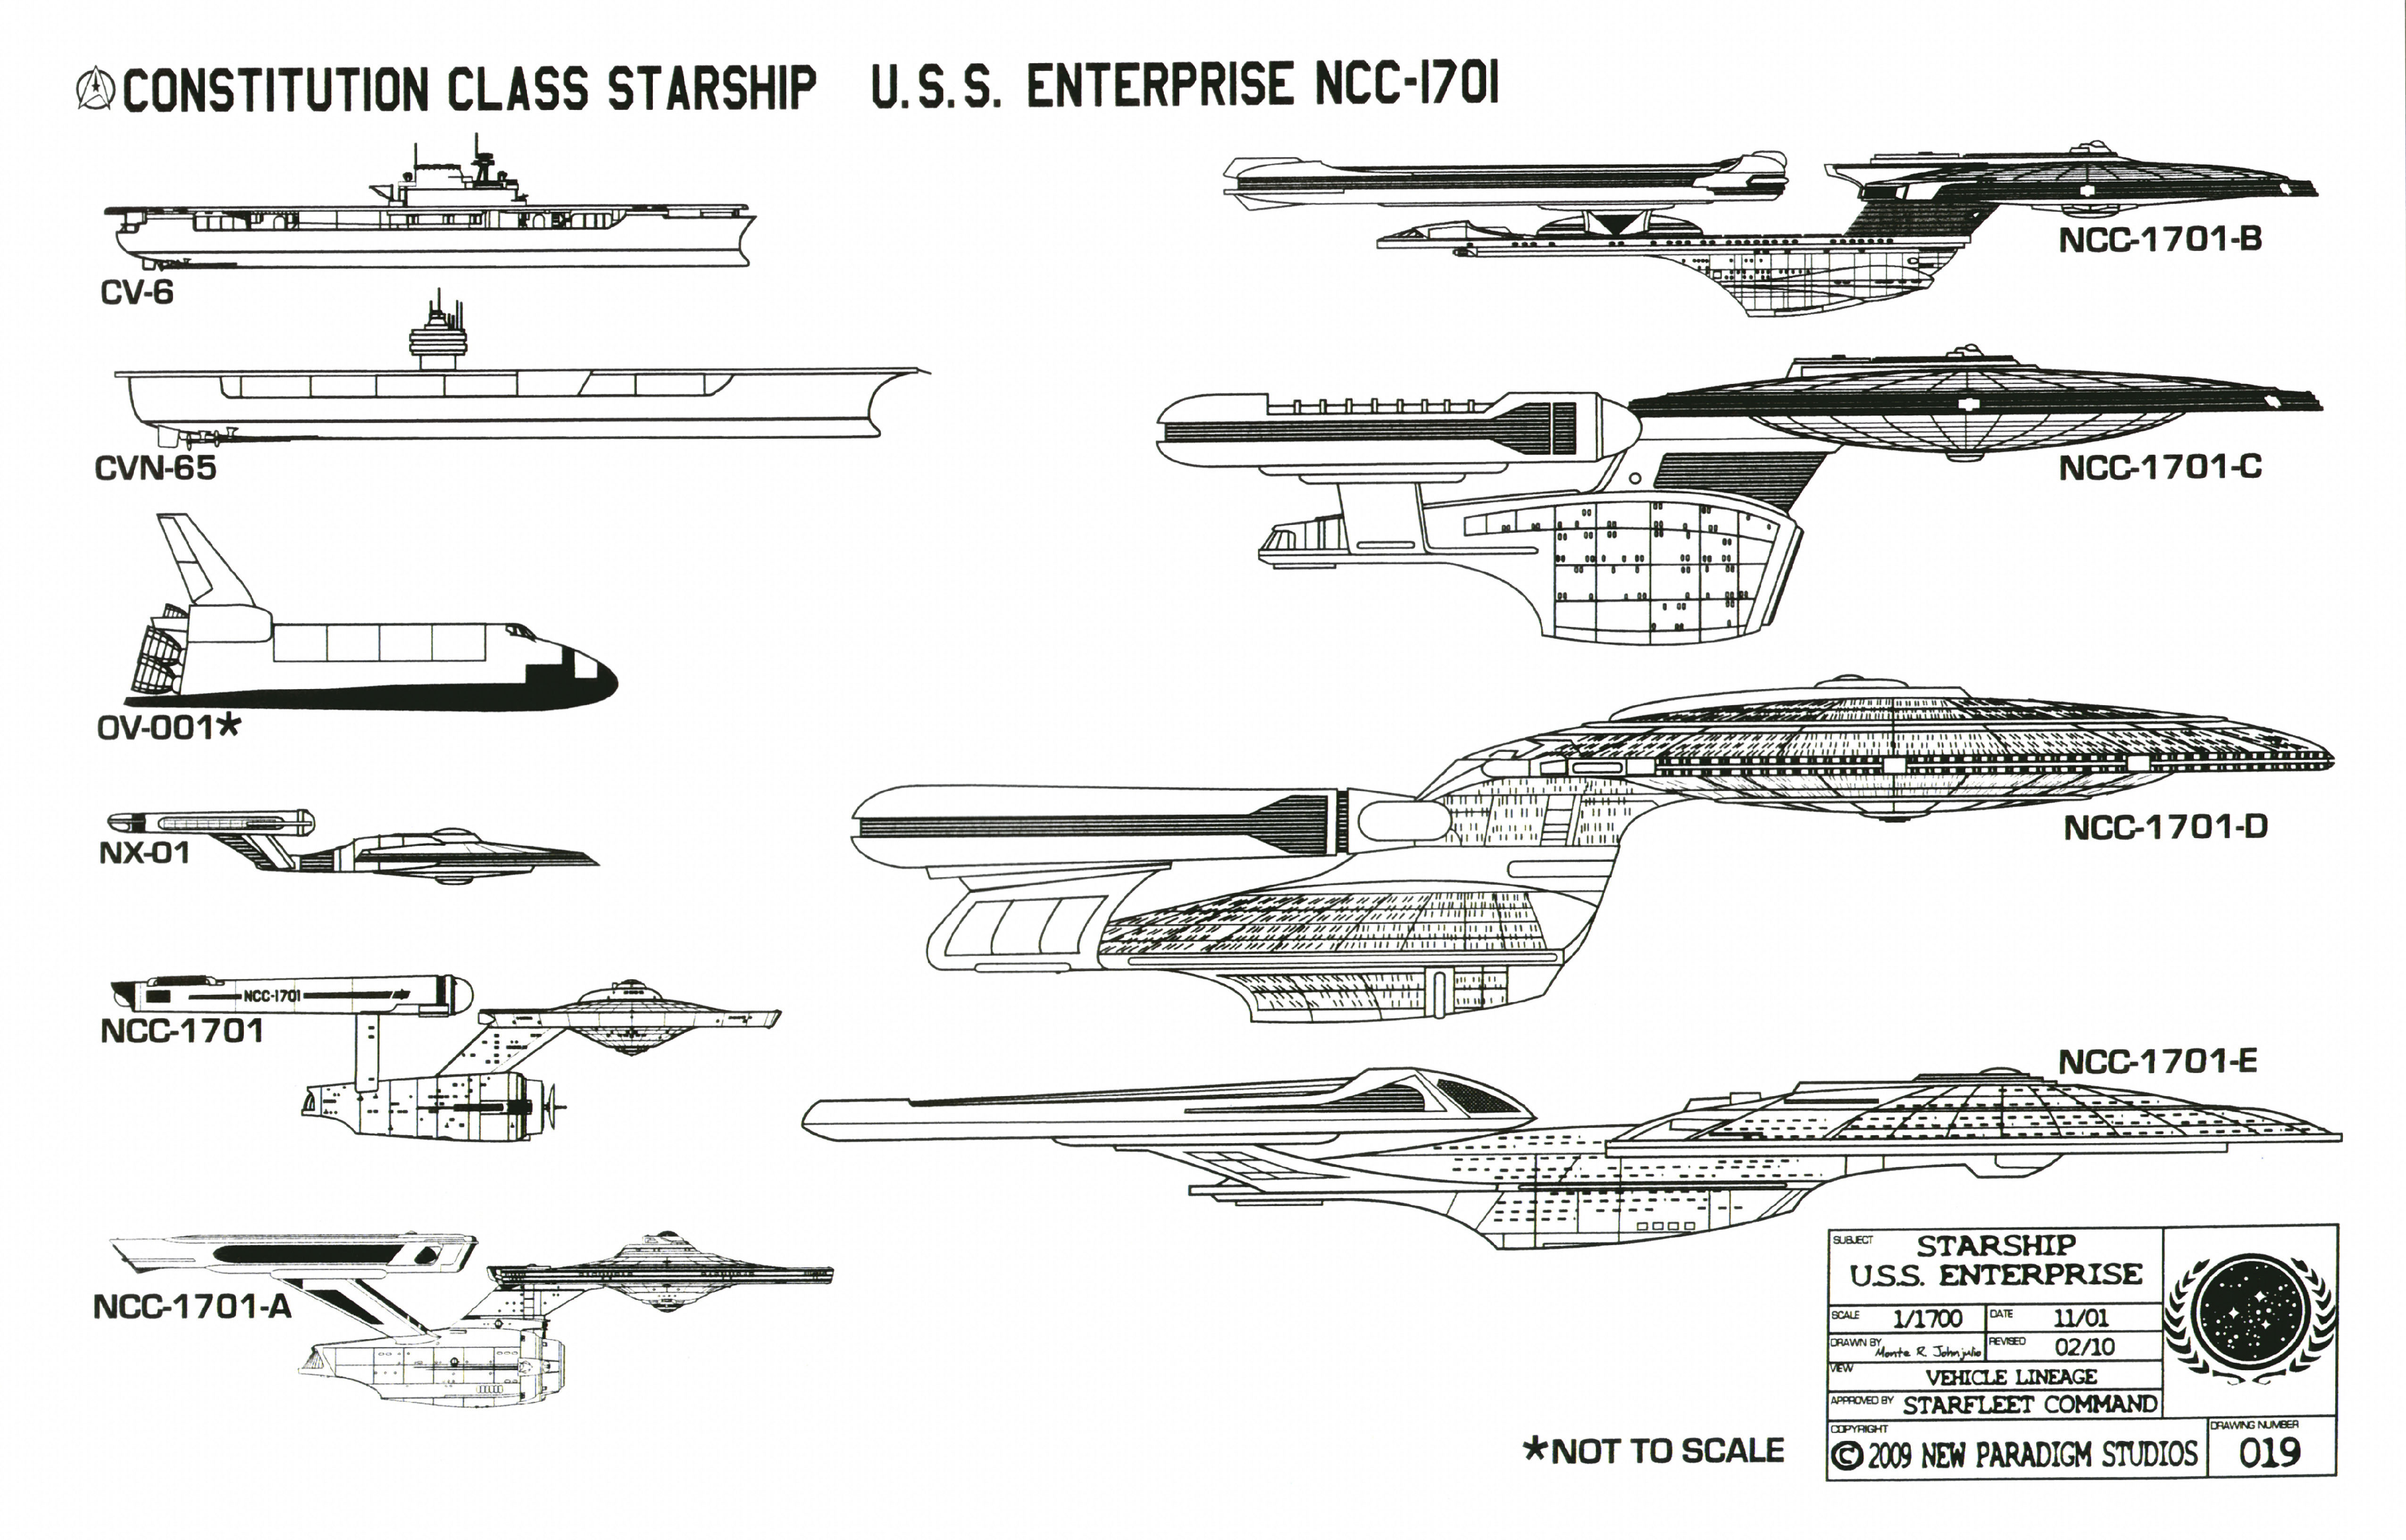 Star trek blueprints constitution class starship uss sheet 18 vessel lineage malvernweather Image collections